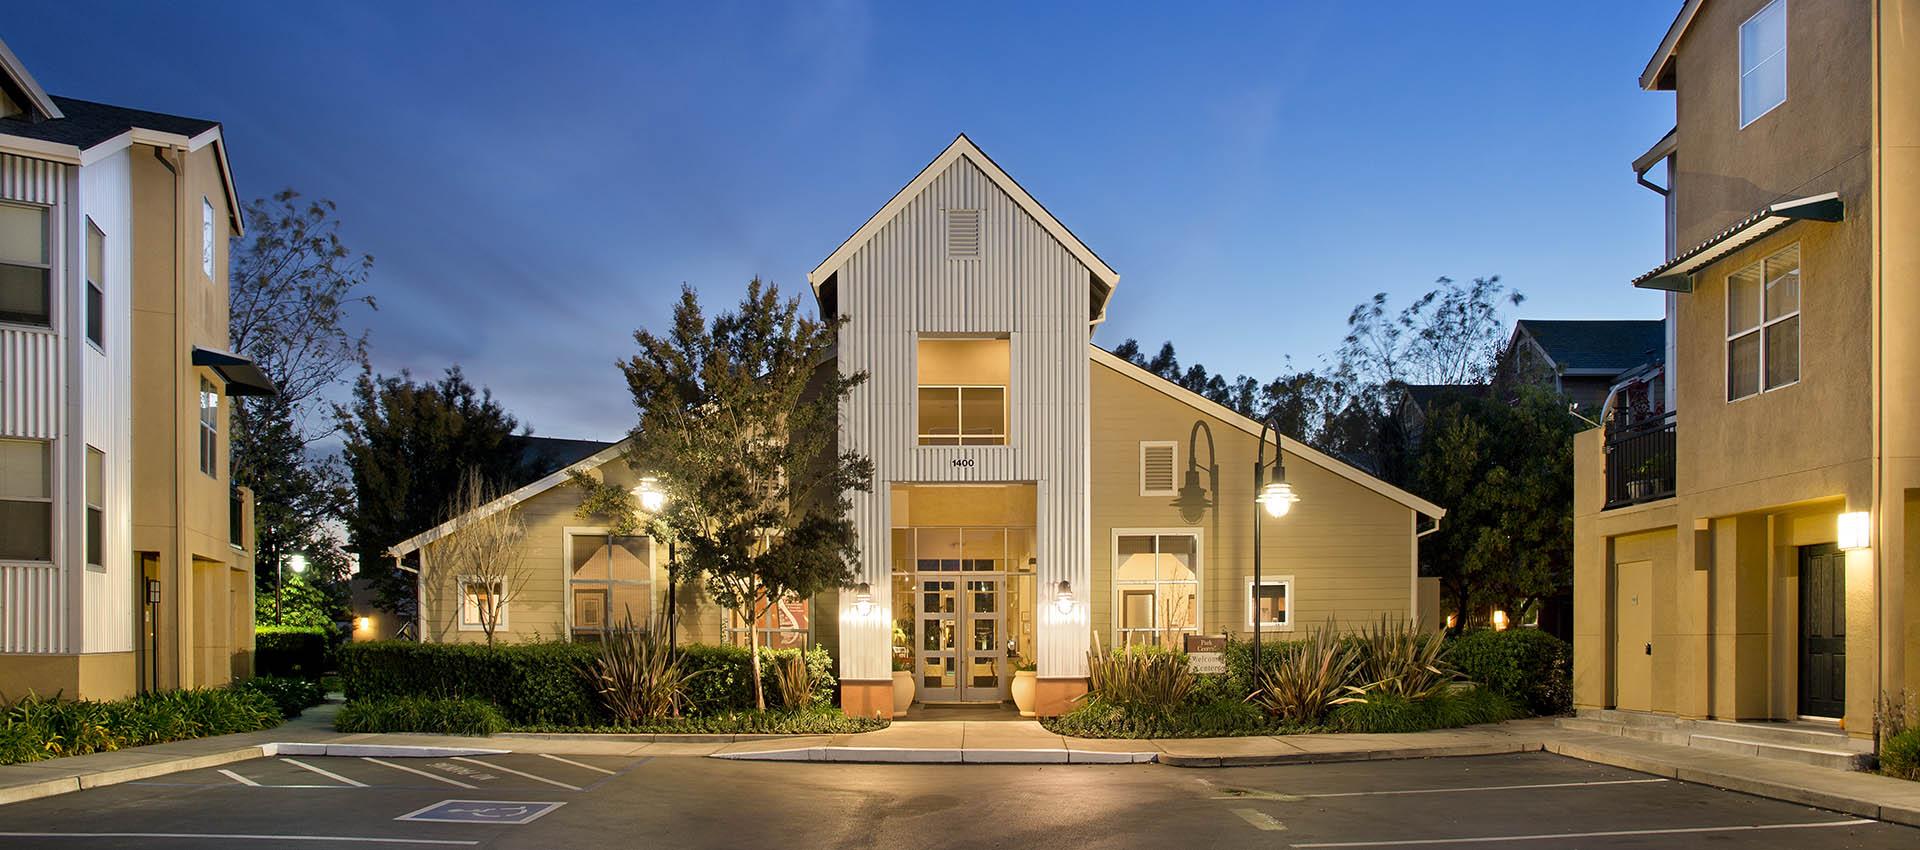 Leasing Office At Night at Azure Apartment Homes in Petaluma, CA